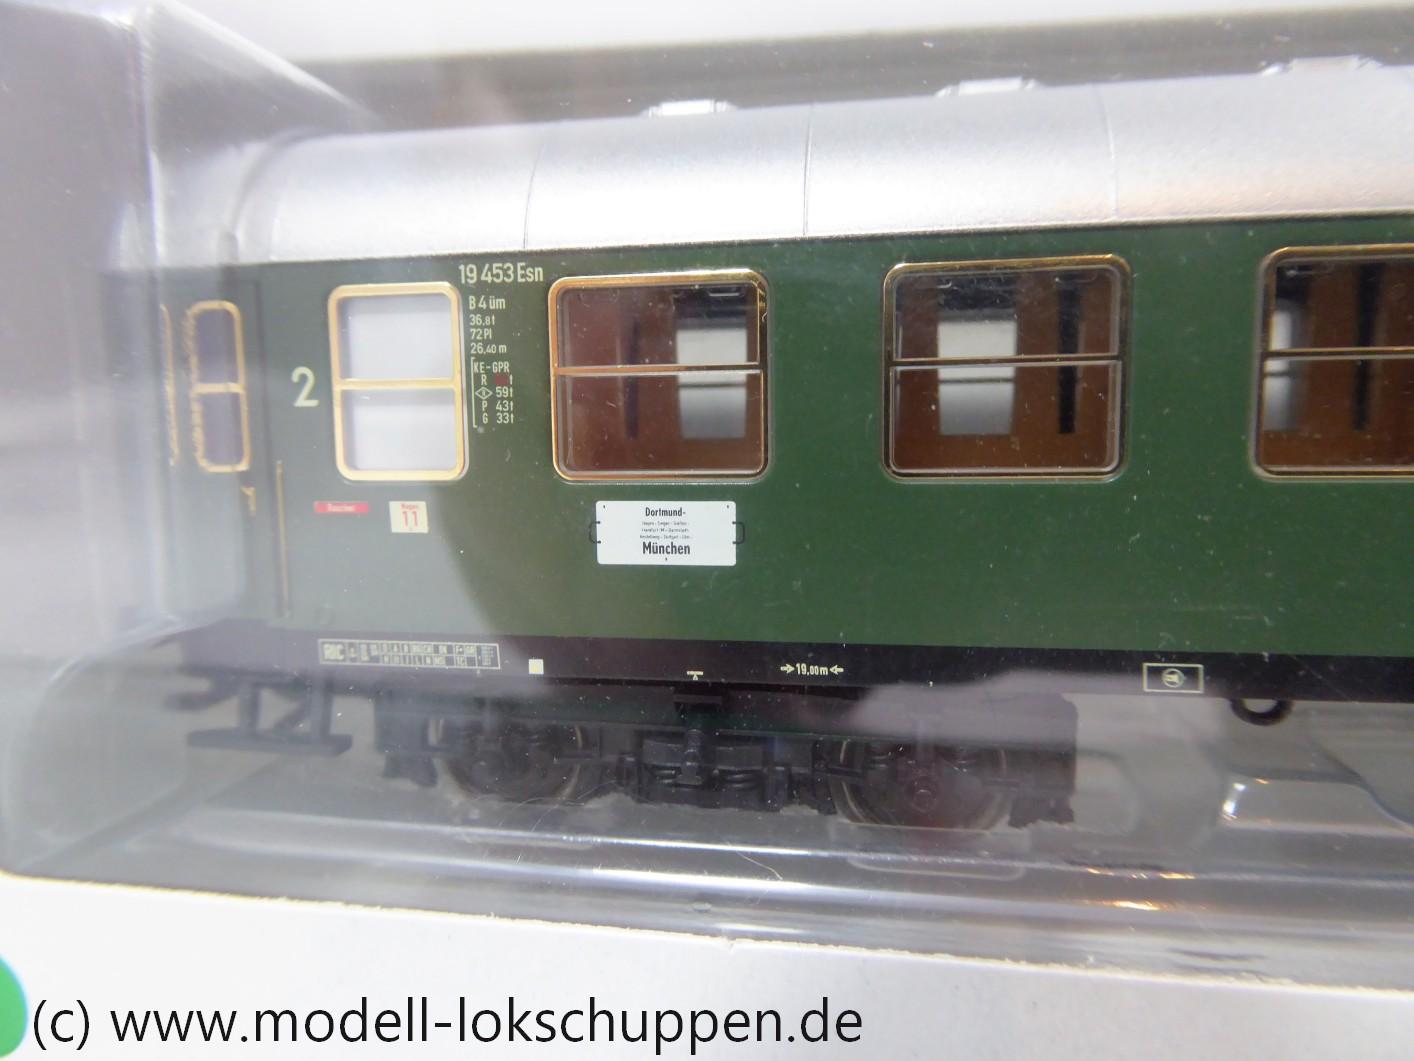 Trix 23401 (Märklin 43920) Schnellzugwagen 2. Klasse DB B4üm-63